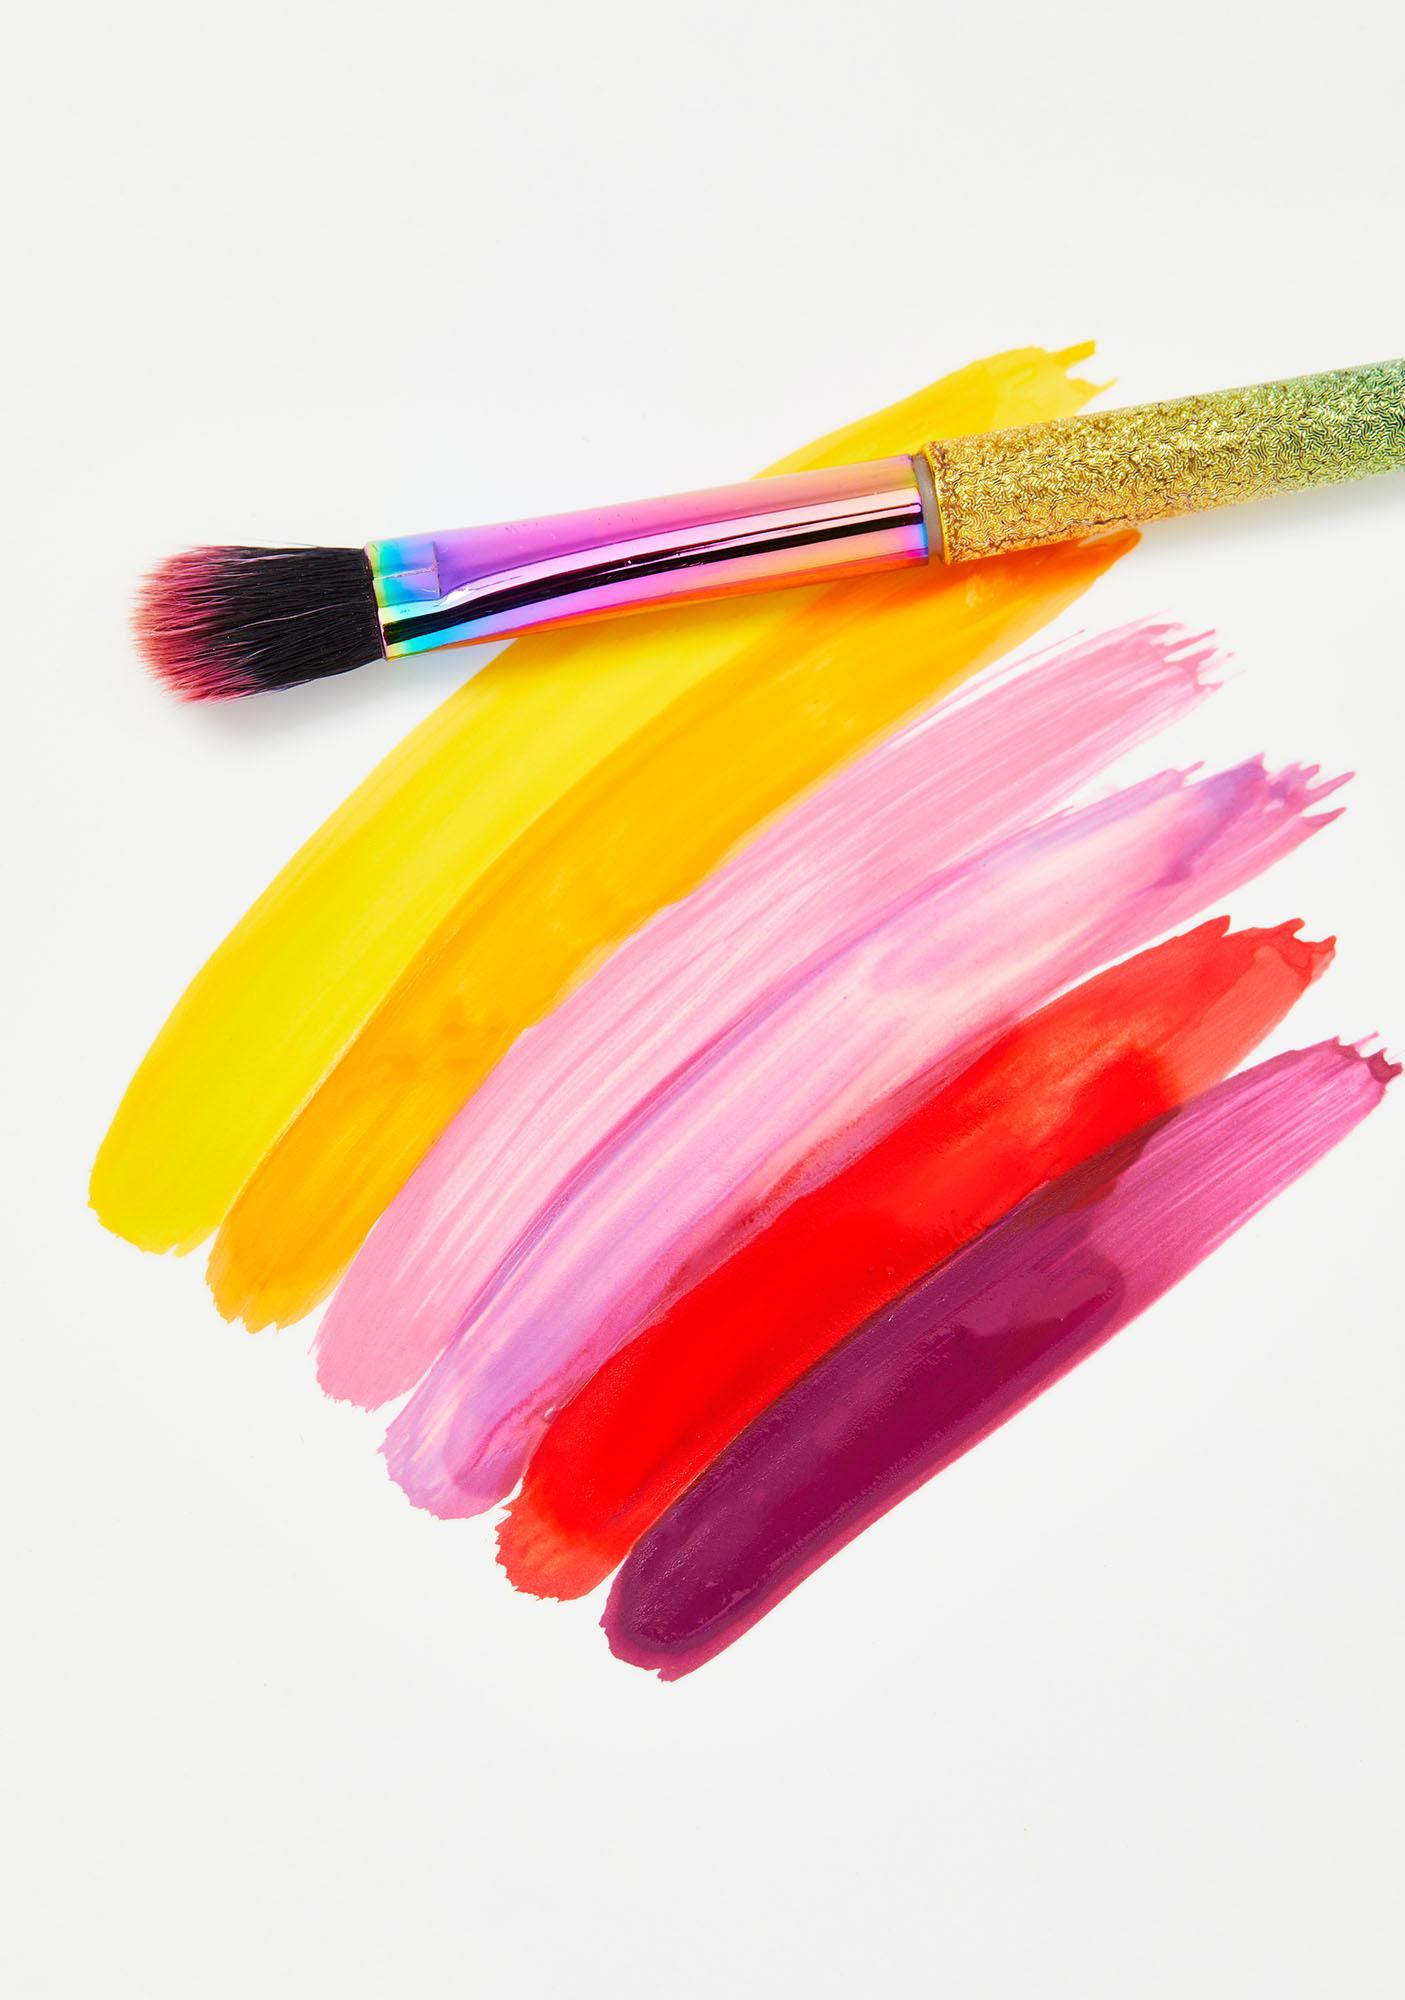 Mehron Sunset AQ Prisma Blendset Palette